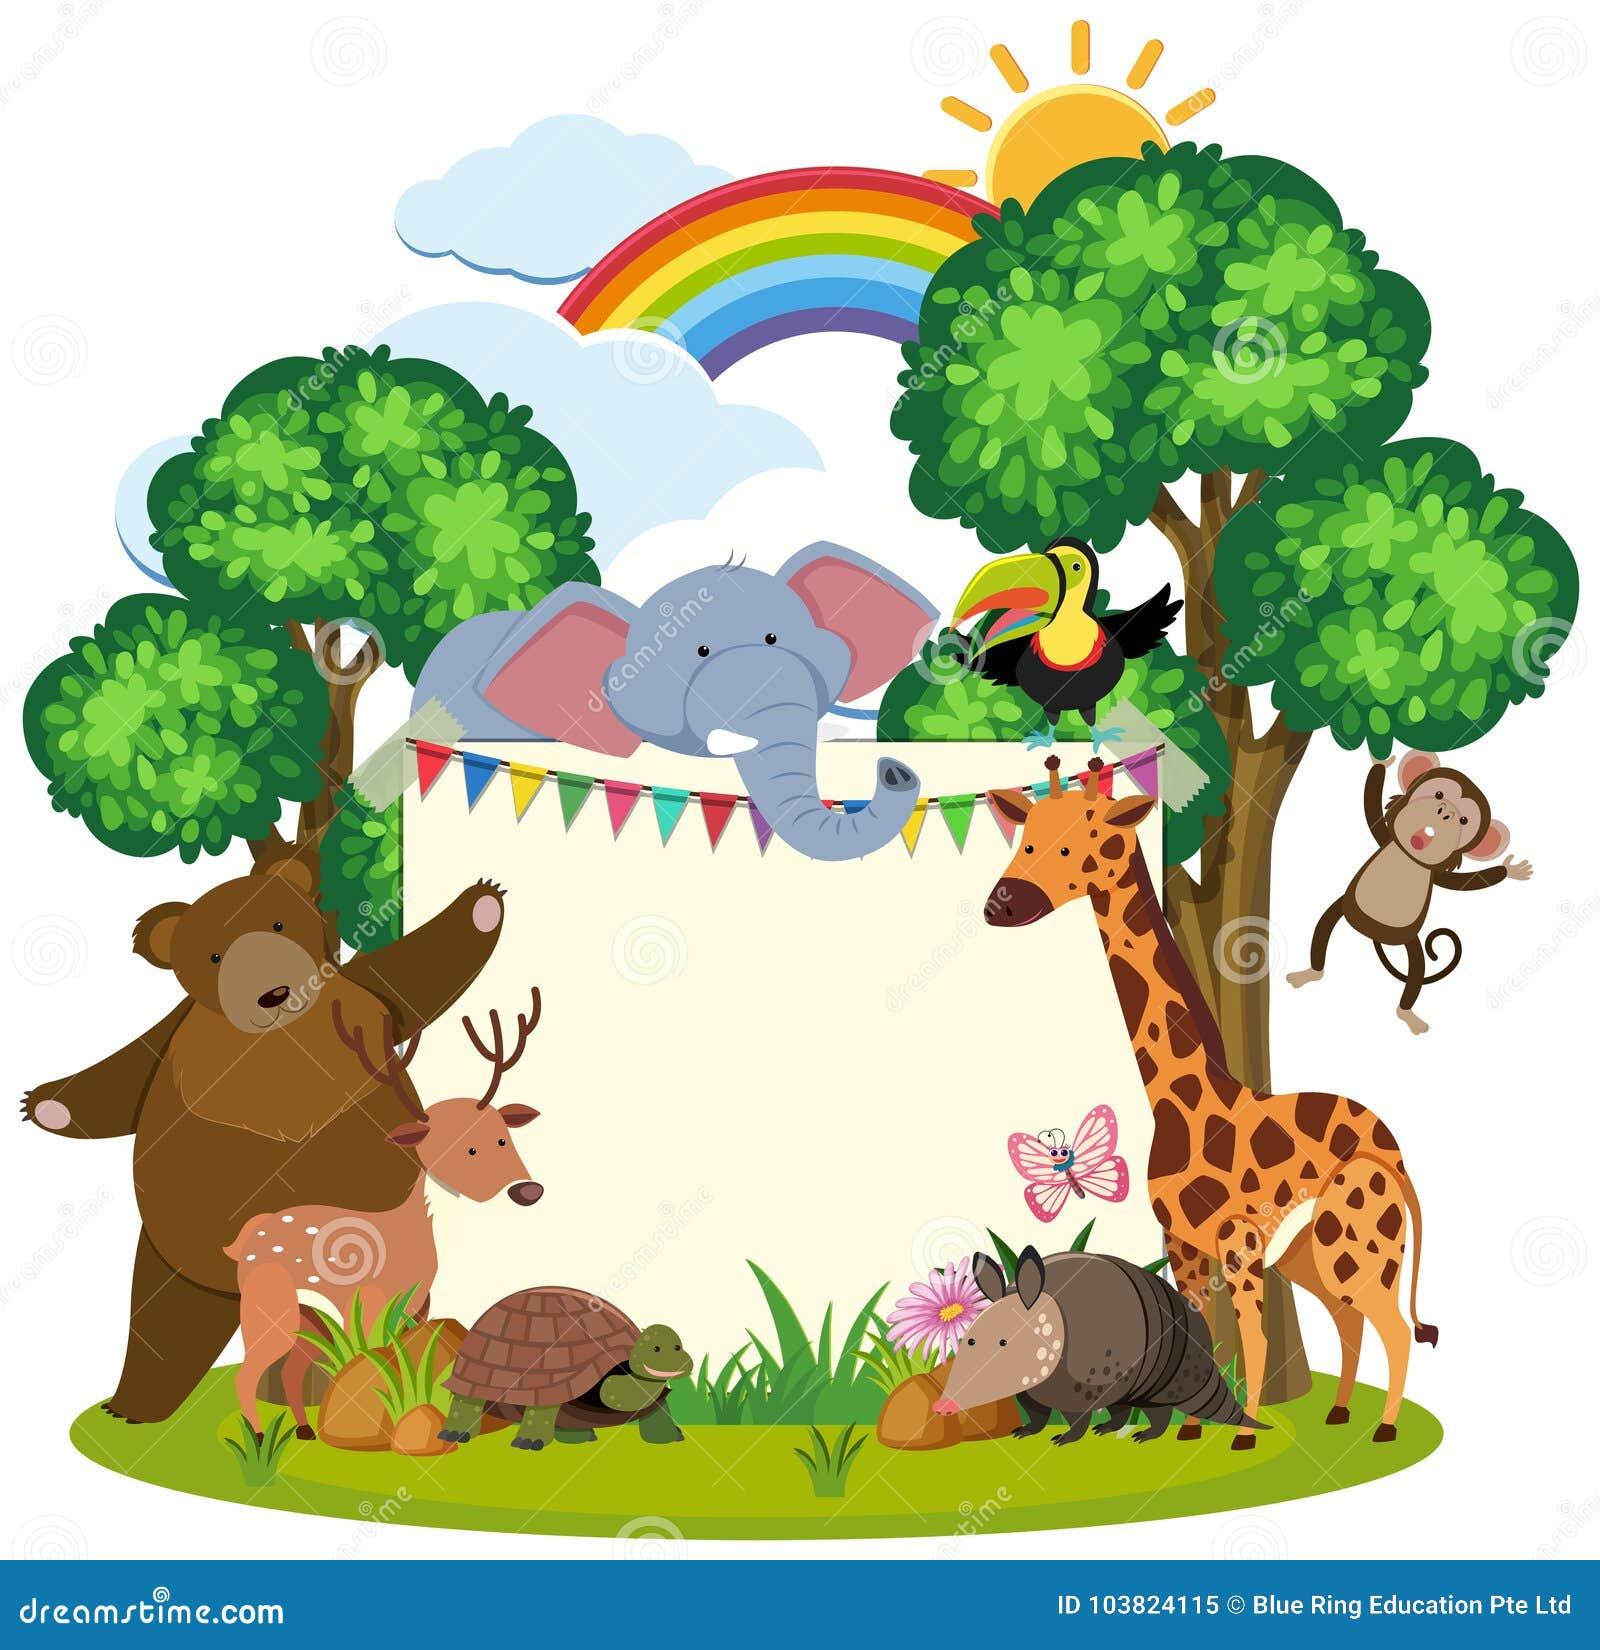 Border Template With Cute Animals In Garden Stock Vector ...